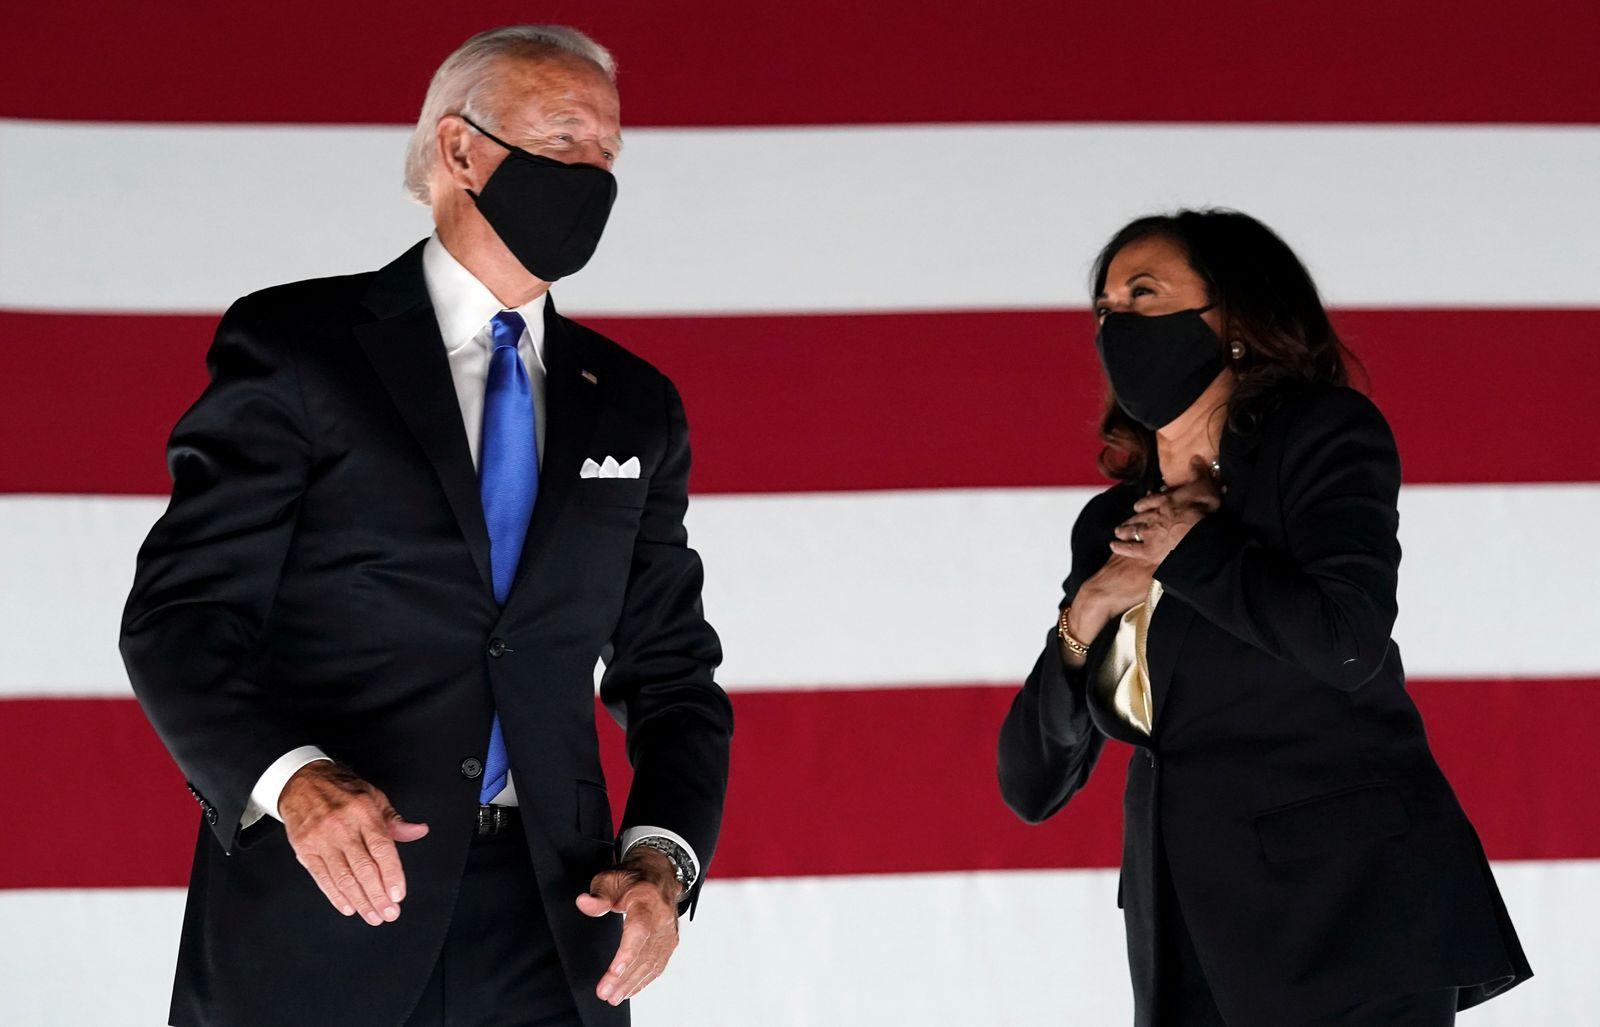 FILE PHOTO: Former U.S. Vice President Joe Biden accepts the 2020 Democratic presidential nomination